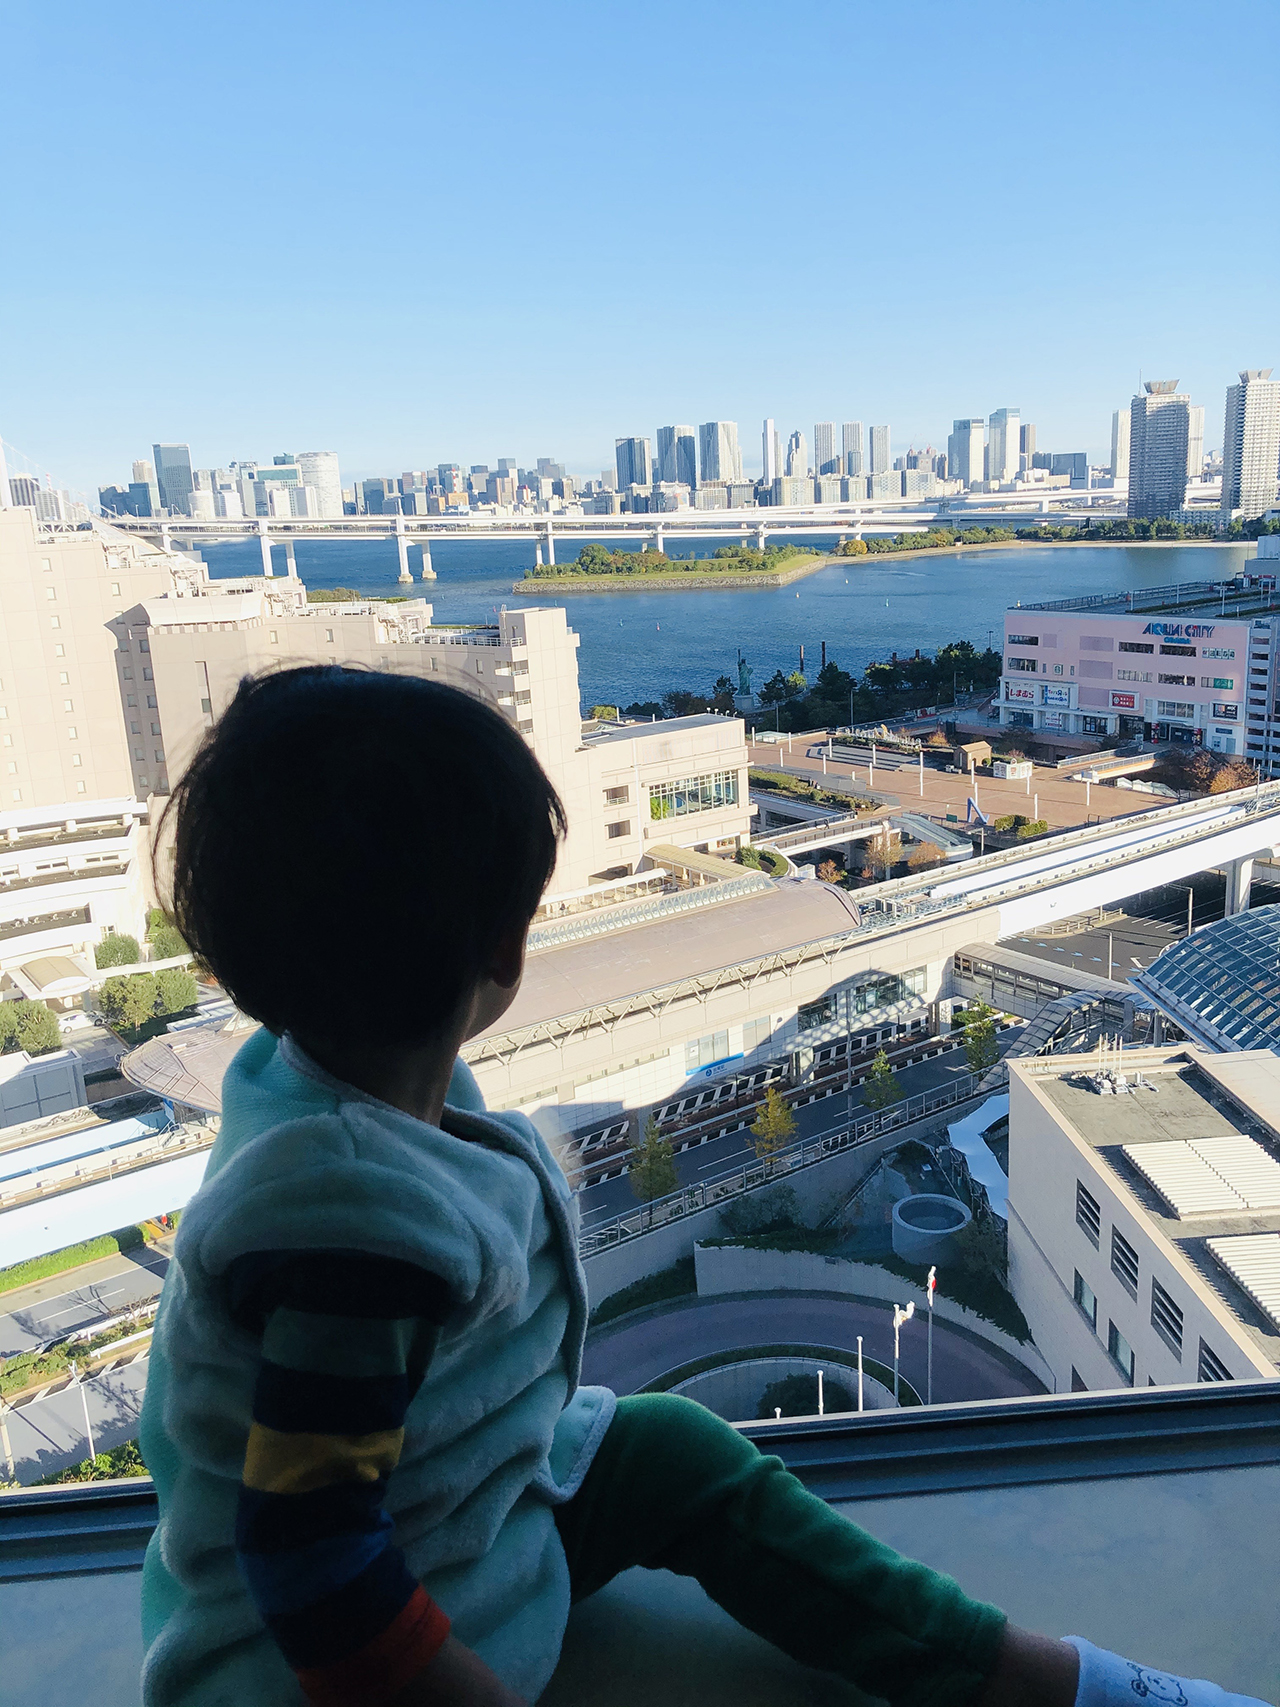 GRAND NIKKO TOKYO DAIBA(グランドニッコー東京 台場)の投稿写真6